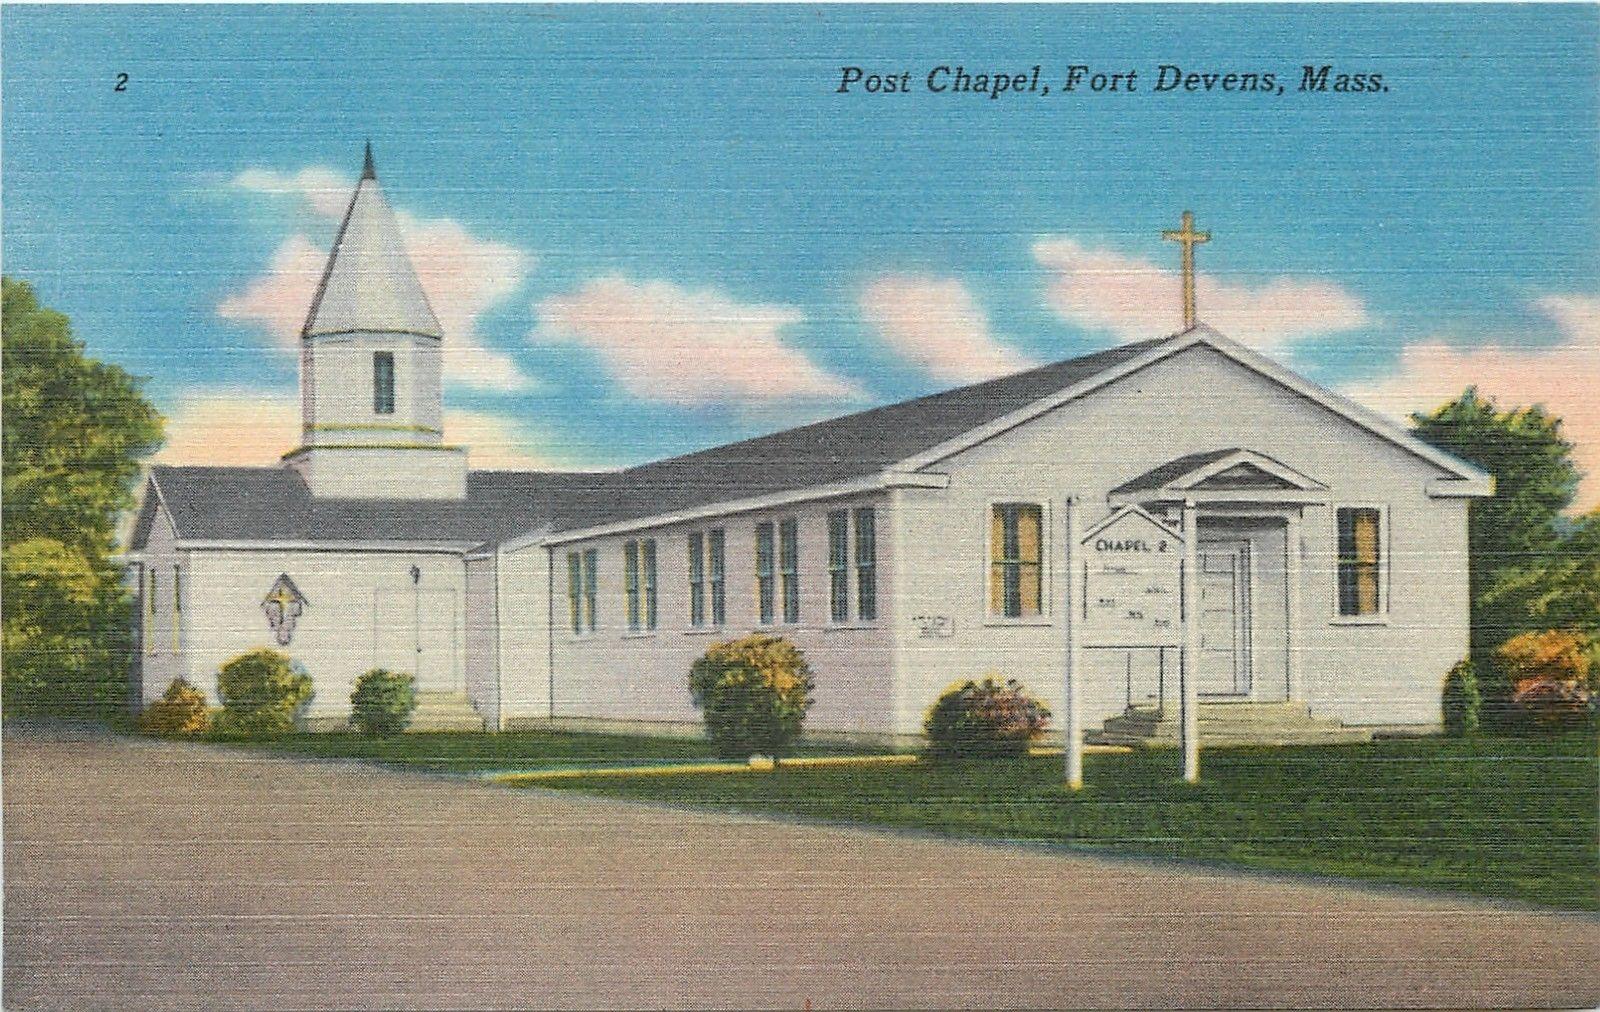 Fort Devens Chapel